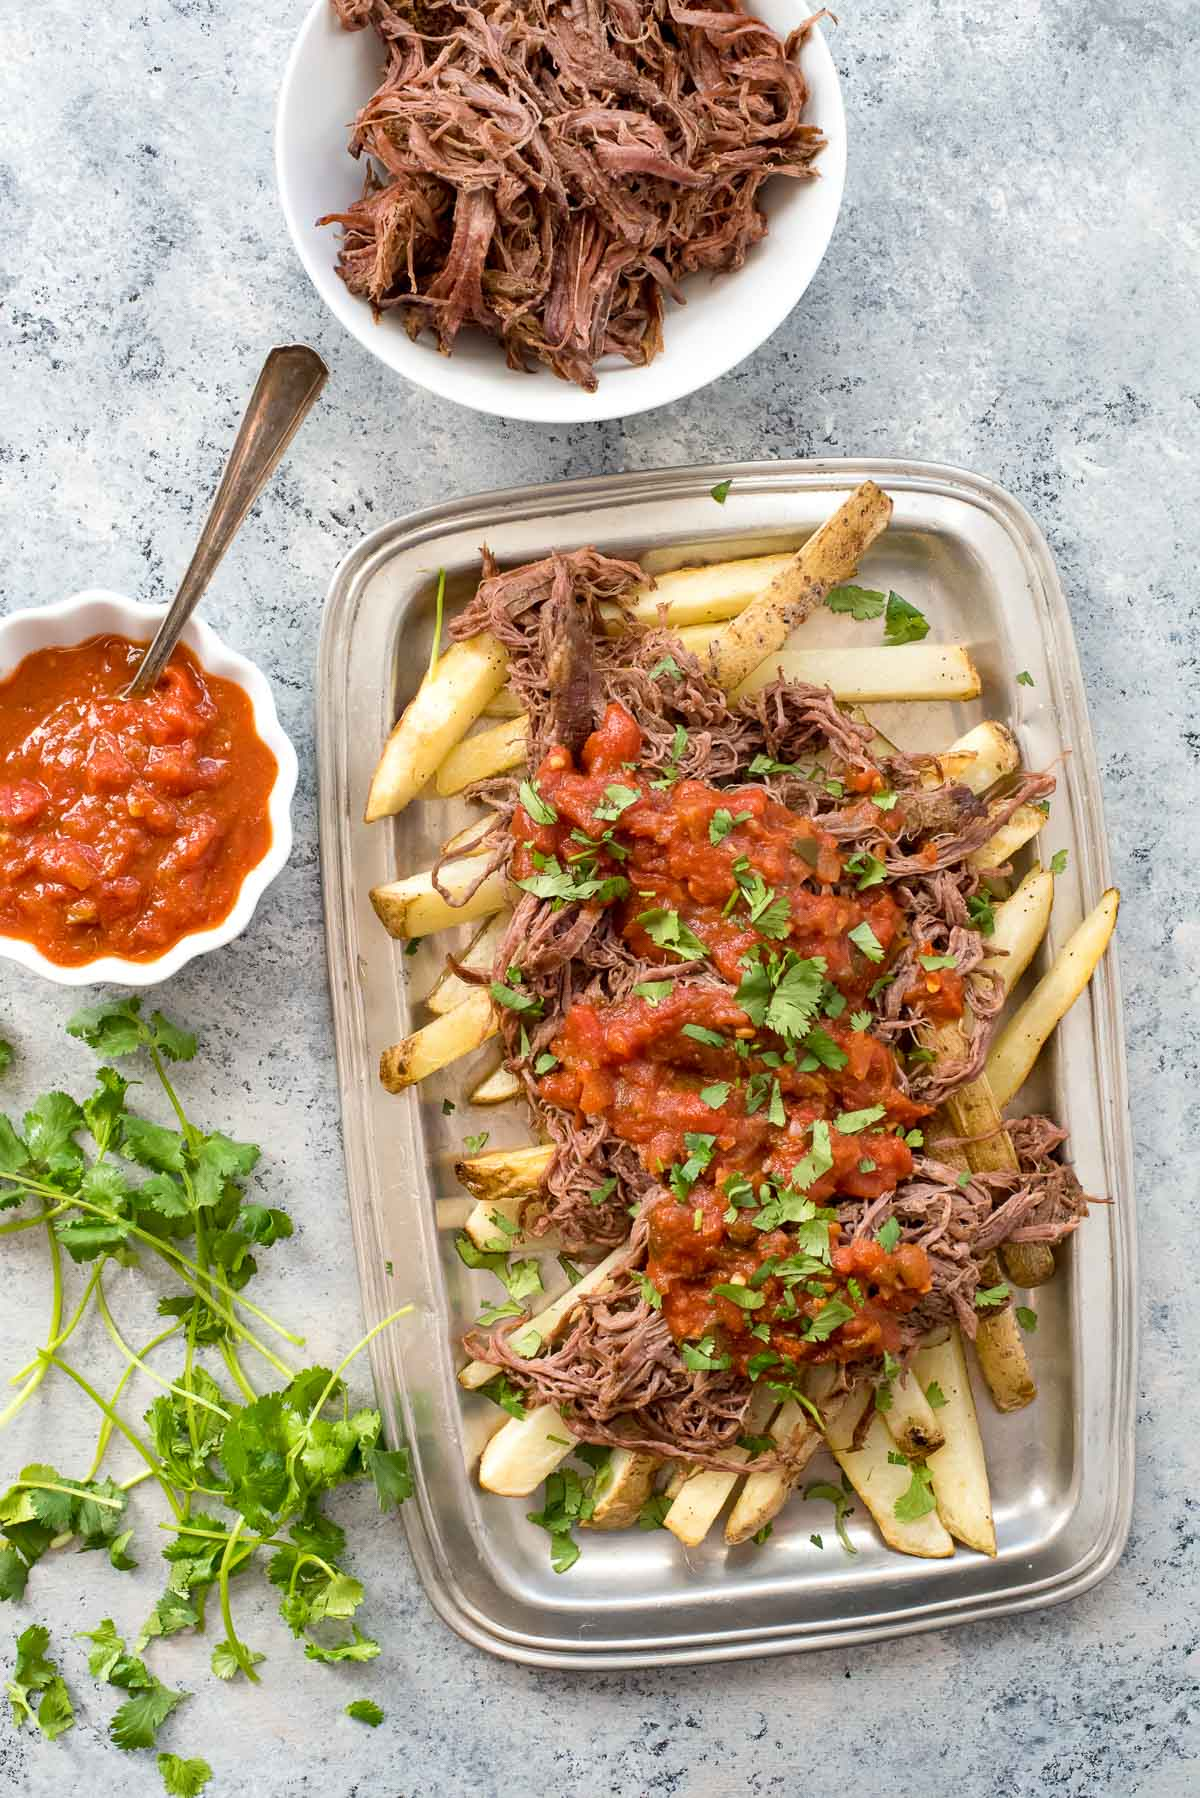 carne asada fries with salsa